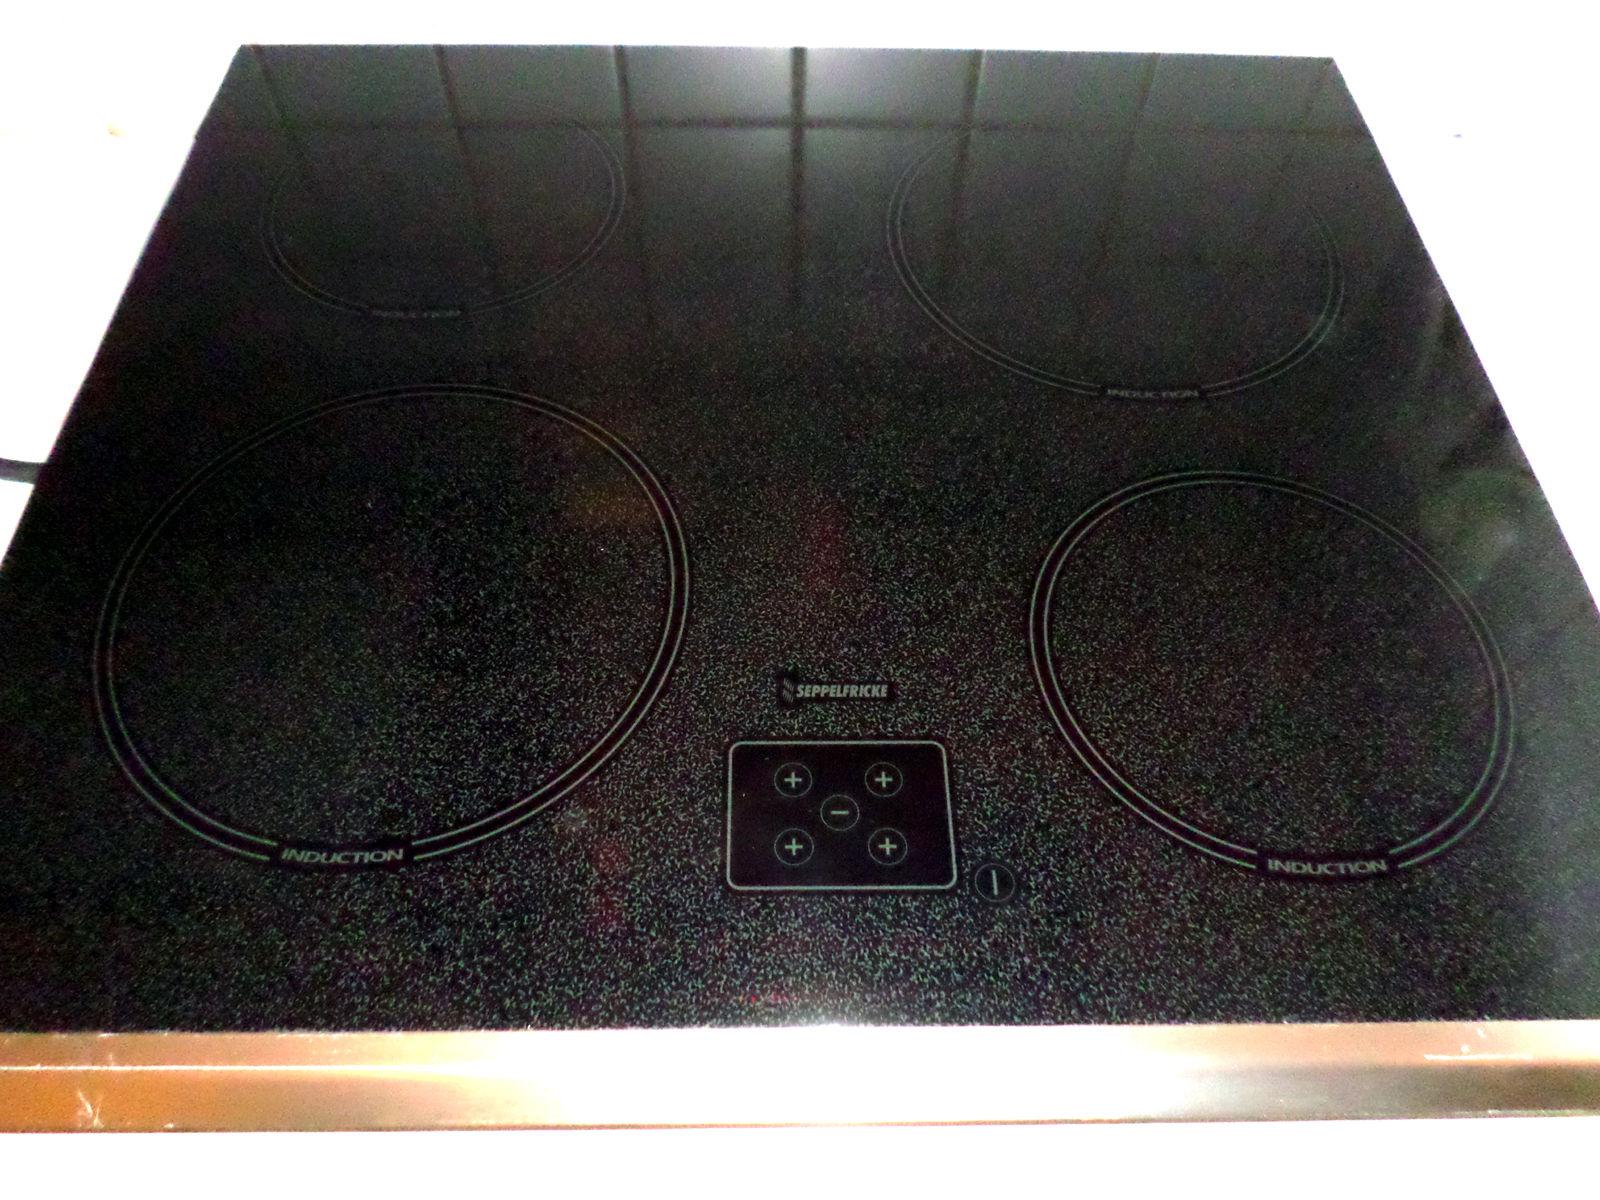 seppelfricke eki 5840 ec7400 induktion autark kochfeld. Black Bedroom Furniture Sets. Home Design Ideas